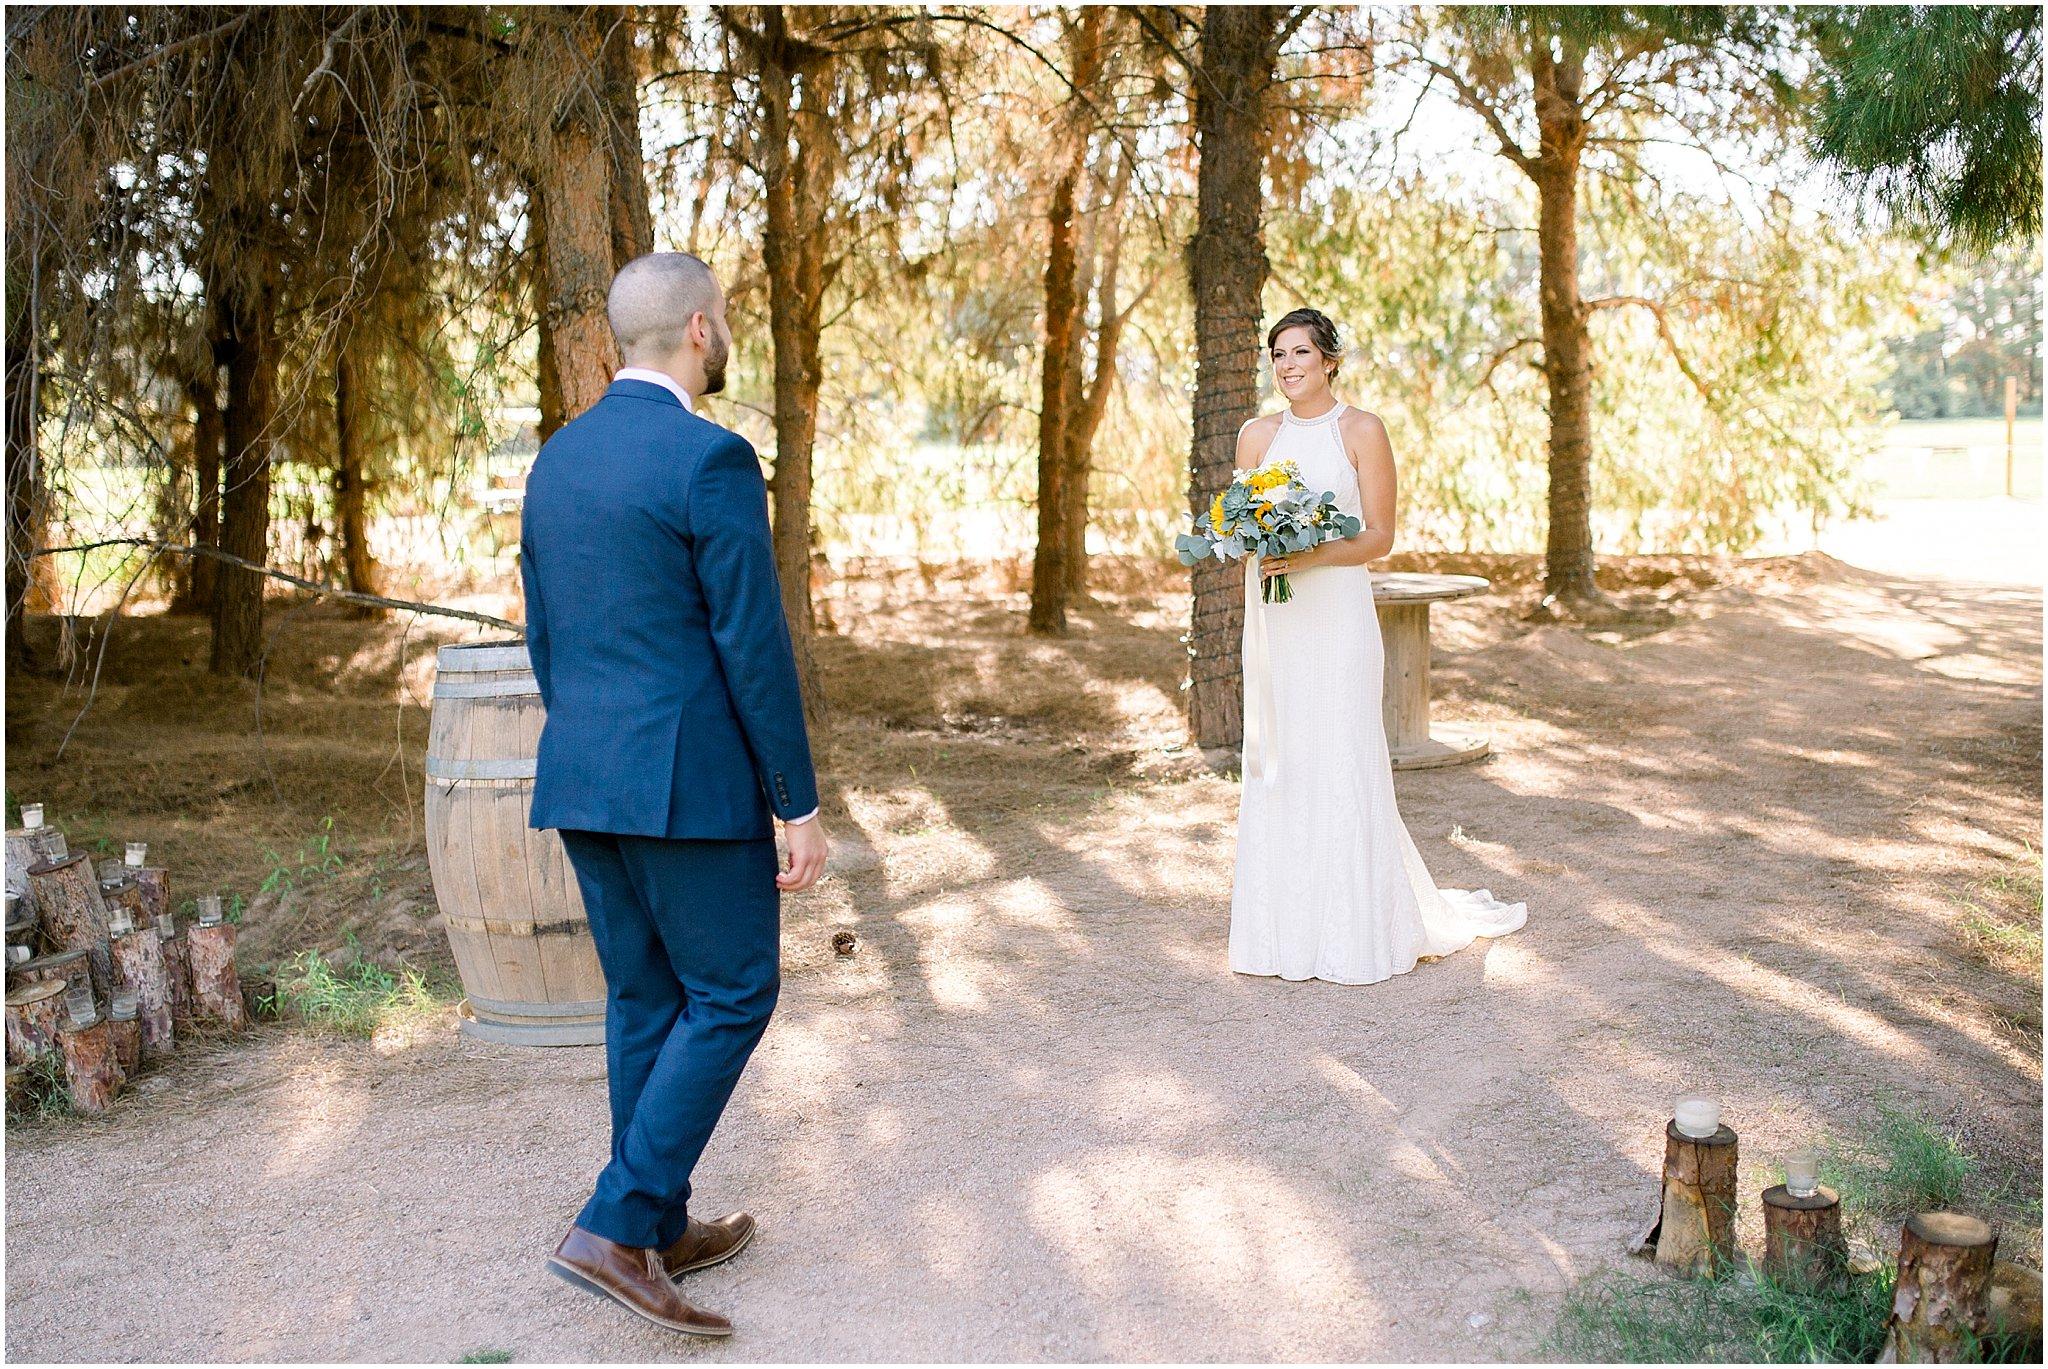 Hyatt-Lodge-Mcdonald-Campus-Wedding_0095.jpg